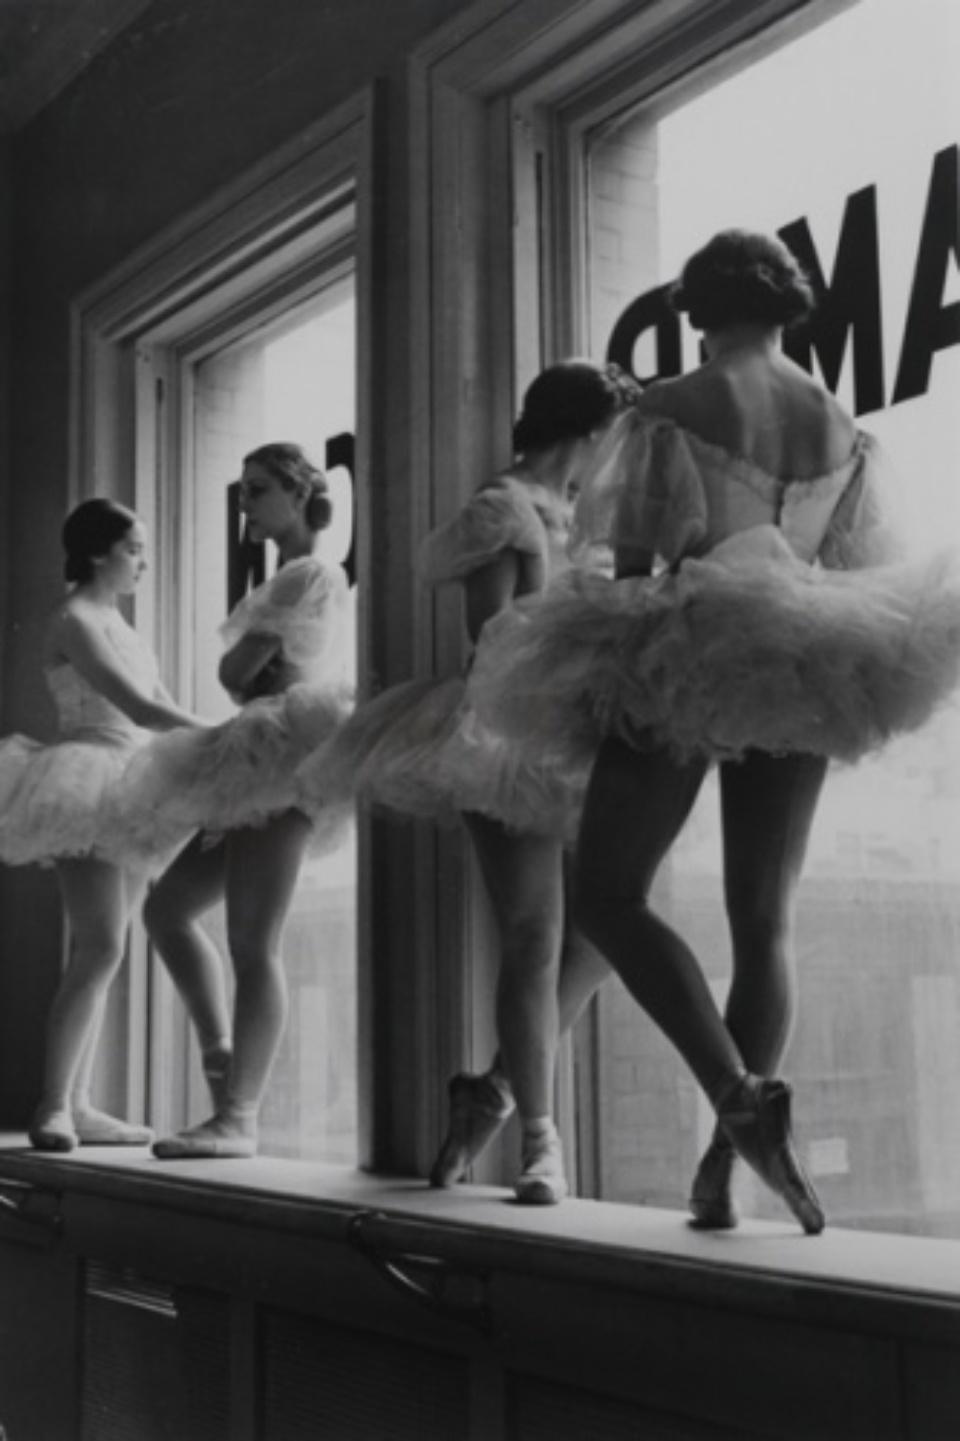 Alfred Eisenstaedt: Four Ballerinas against Window at American Ballet School, New York, 1936 Vintage gelatin silver print, Signed and stamped on verso c 20 x 31 cm